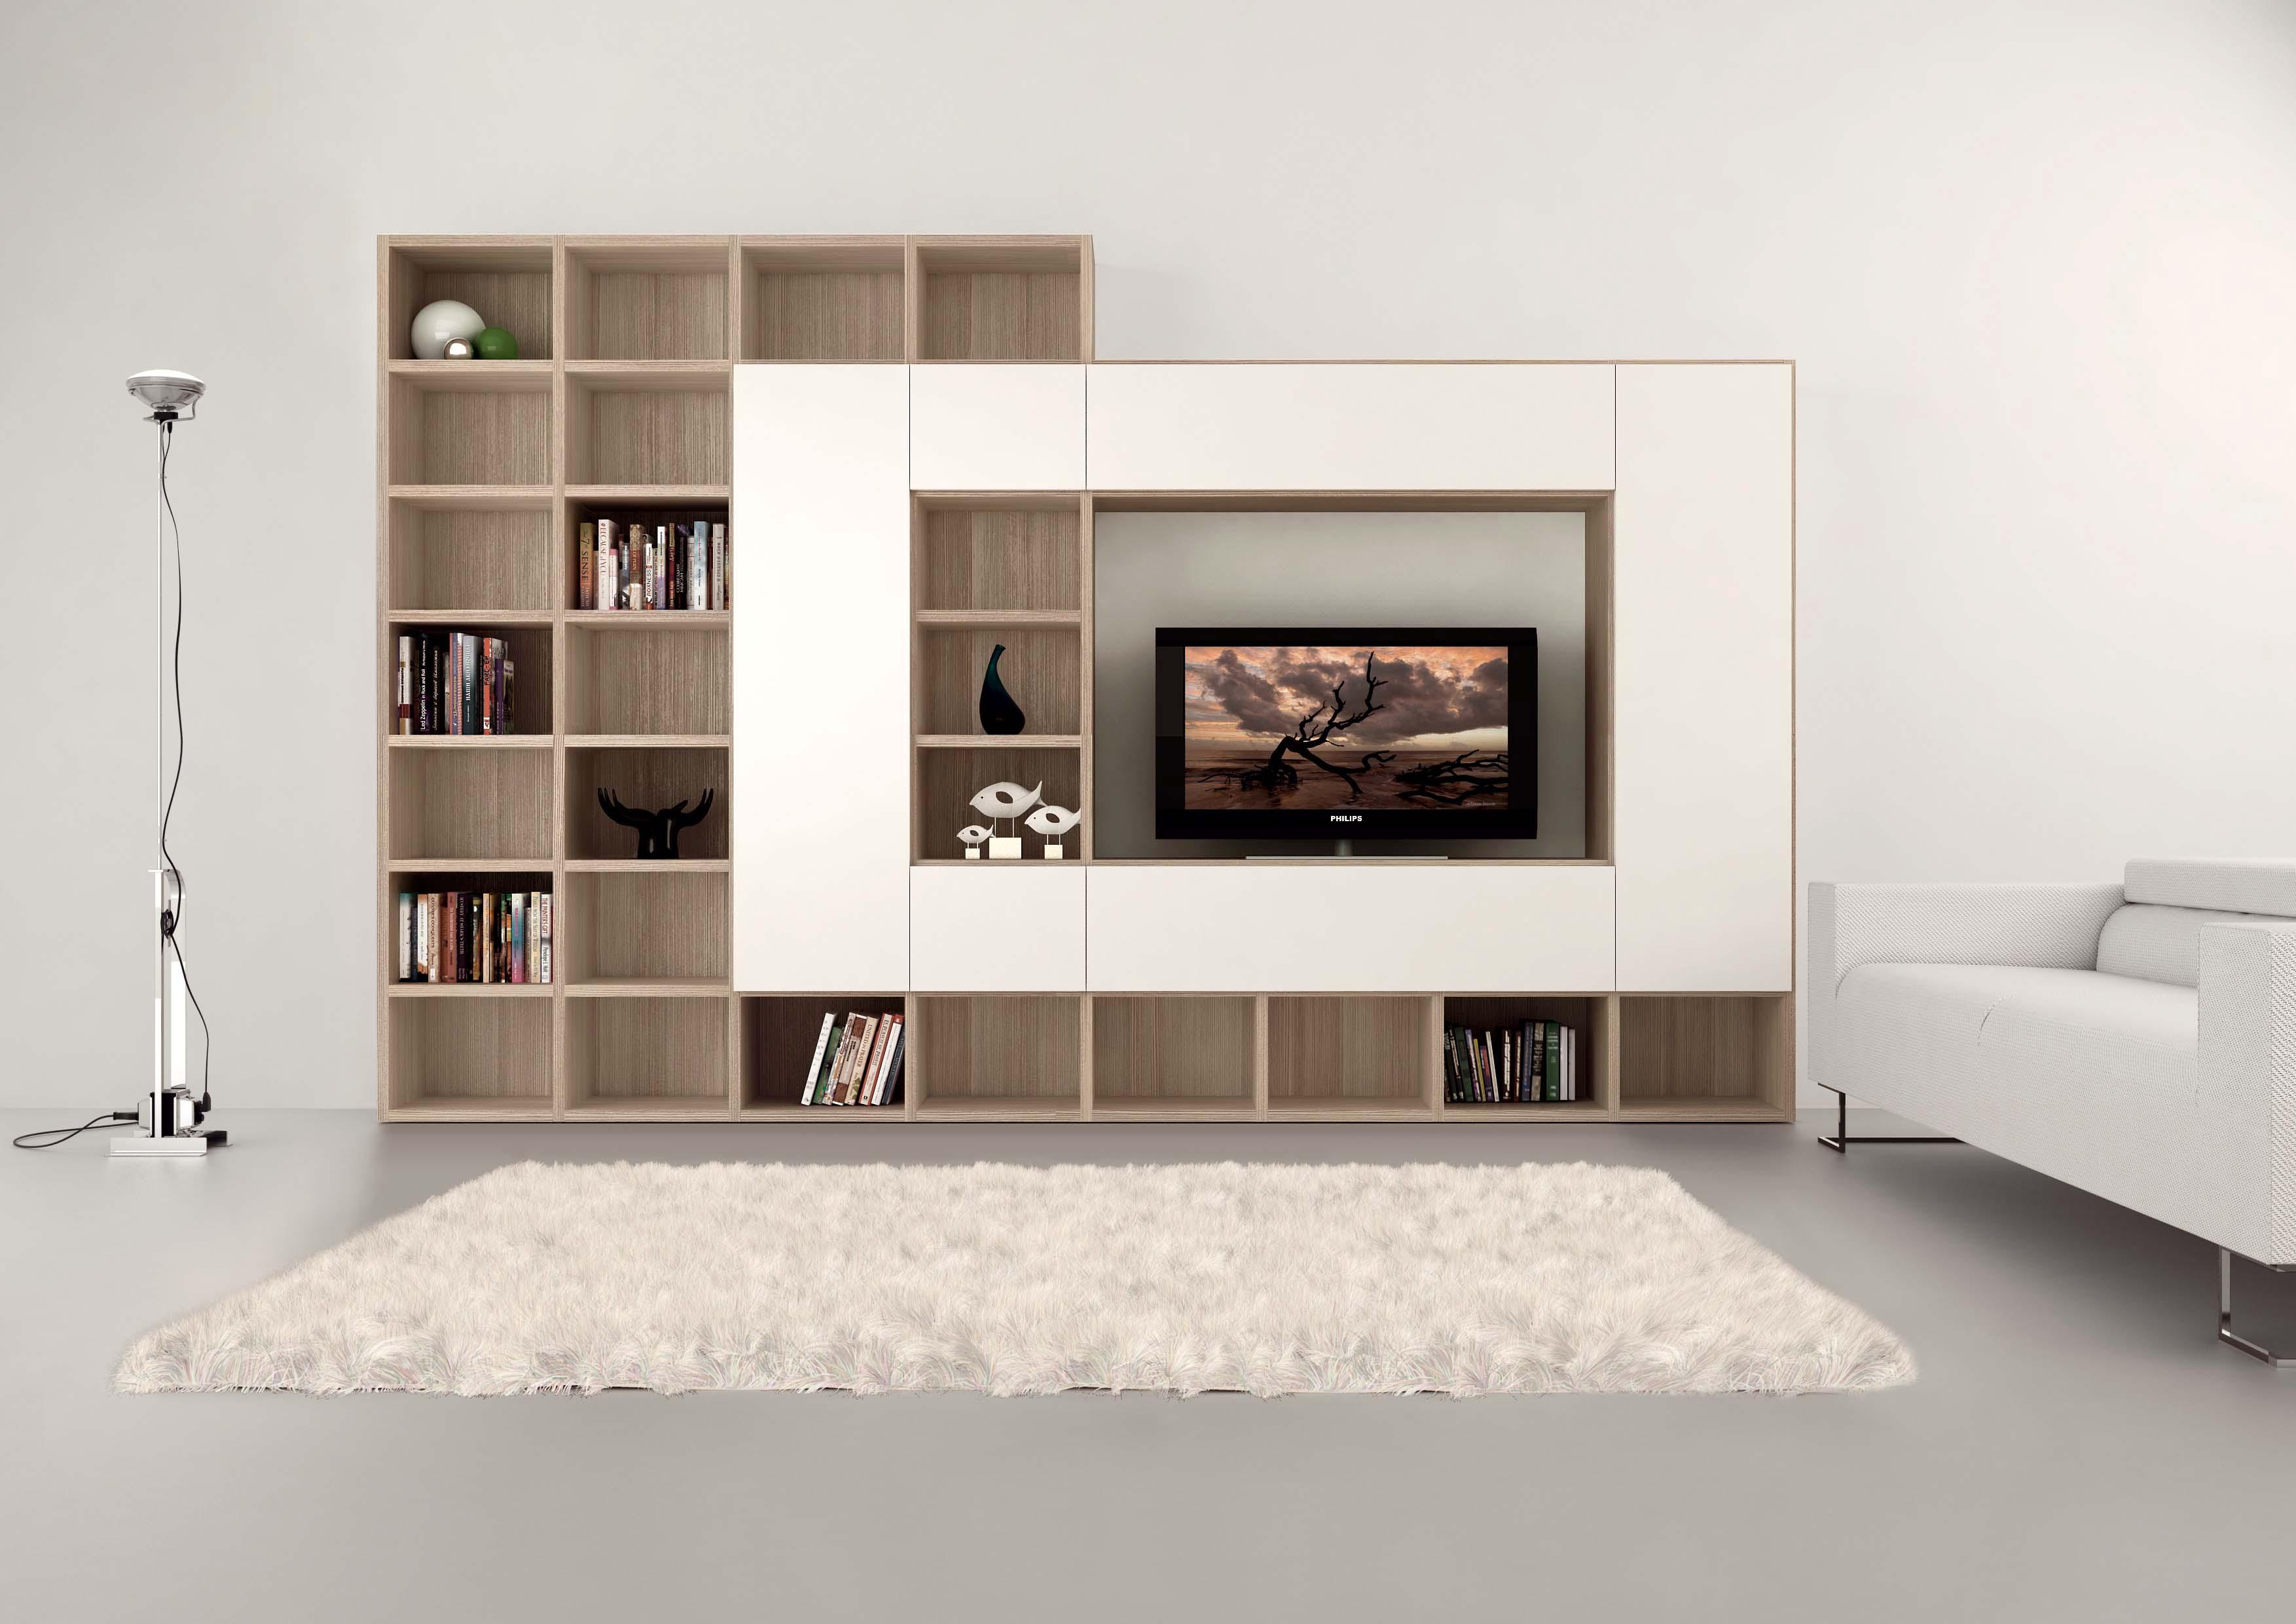 Ikea Tv Meubel Kast.Ikea Kasten In Elkaar Laten Zetten Met Montageservice Tgwonen